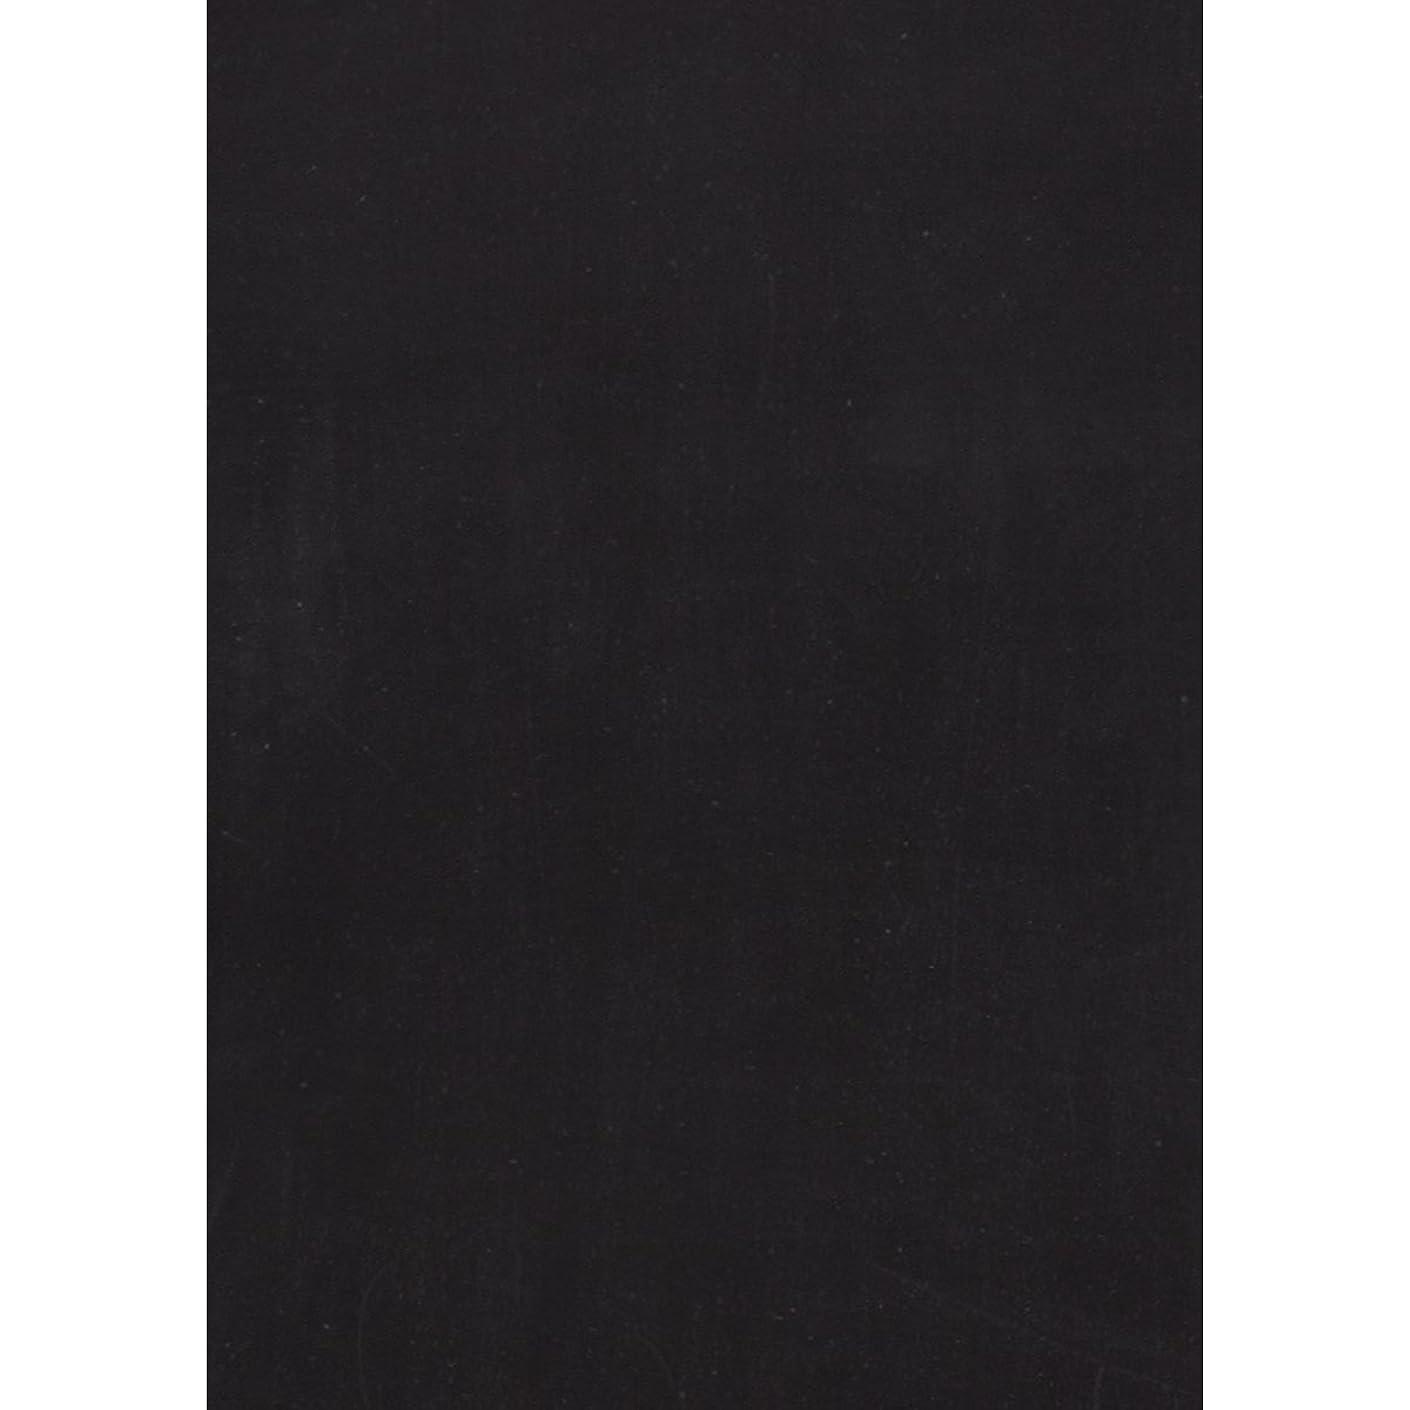 Lucky Dip Chalkboard Paper 8.25